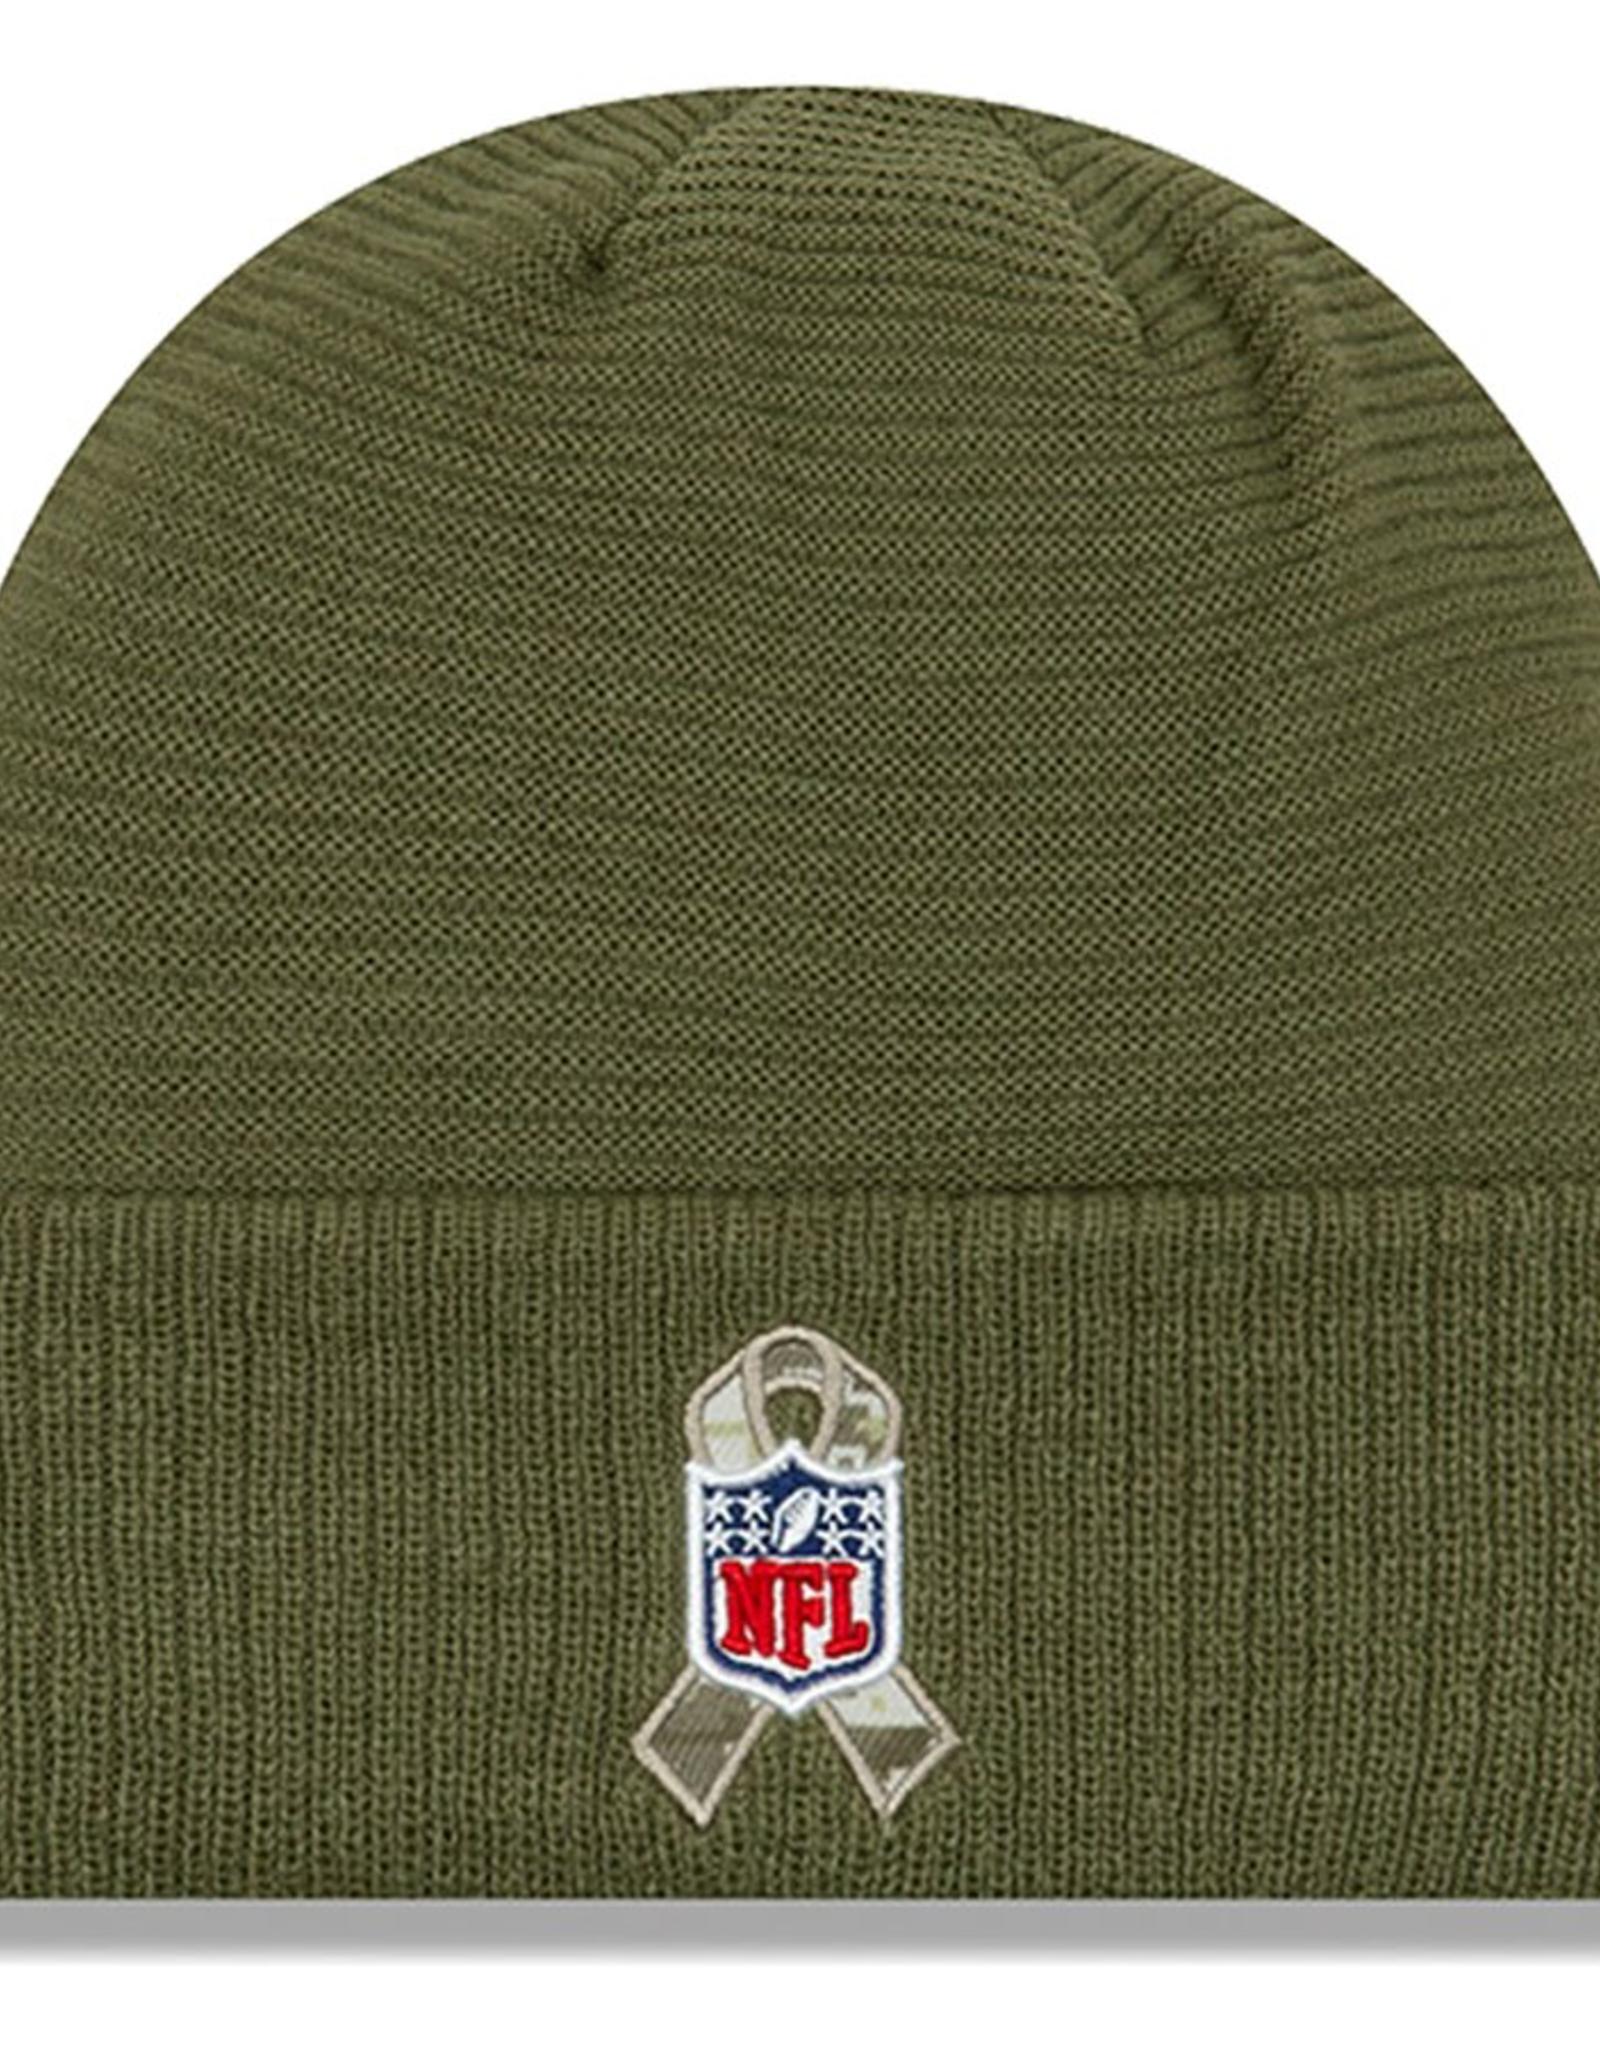 NEW ERA Pittsburgh Steelers New Era NFL 2019 Salute to Service Cuffed Knit Hat